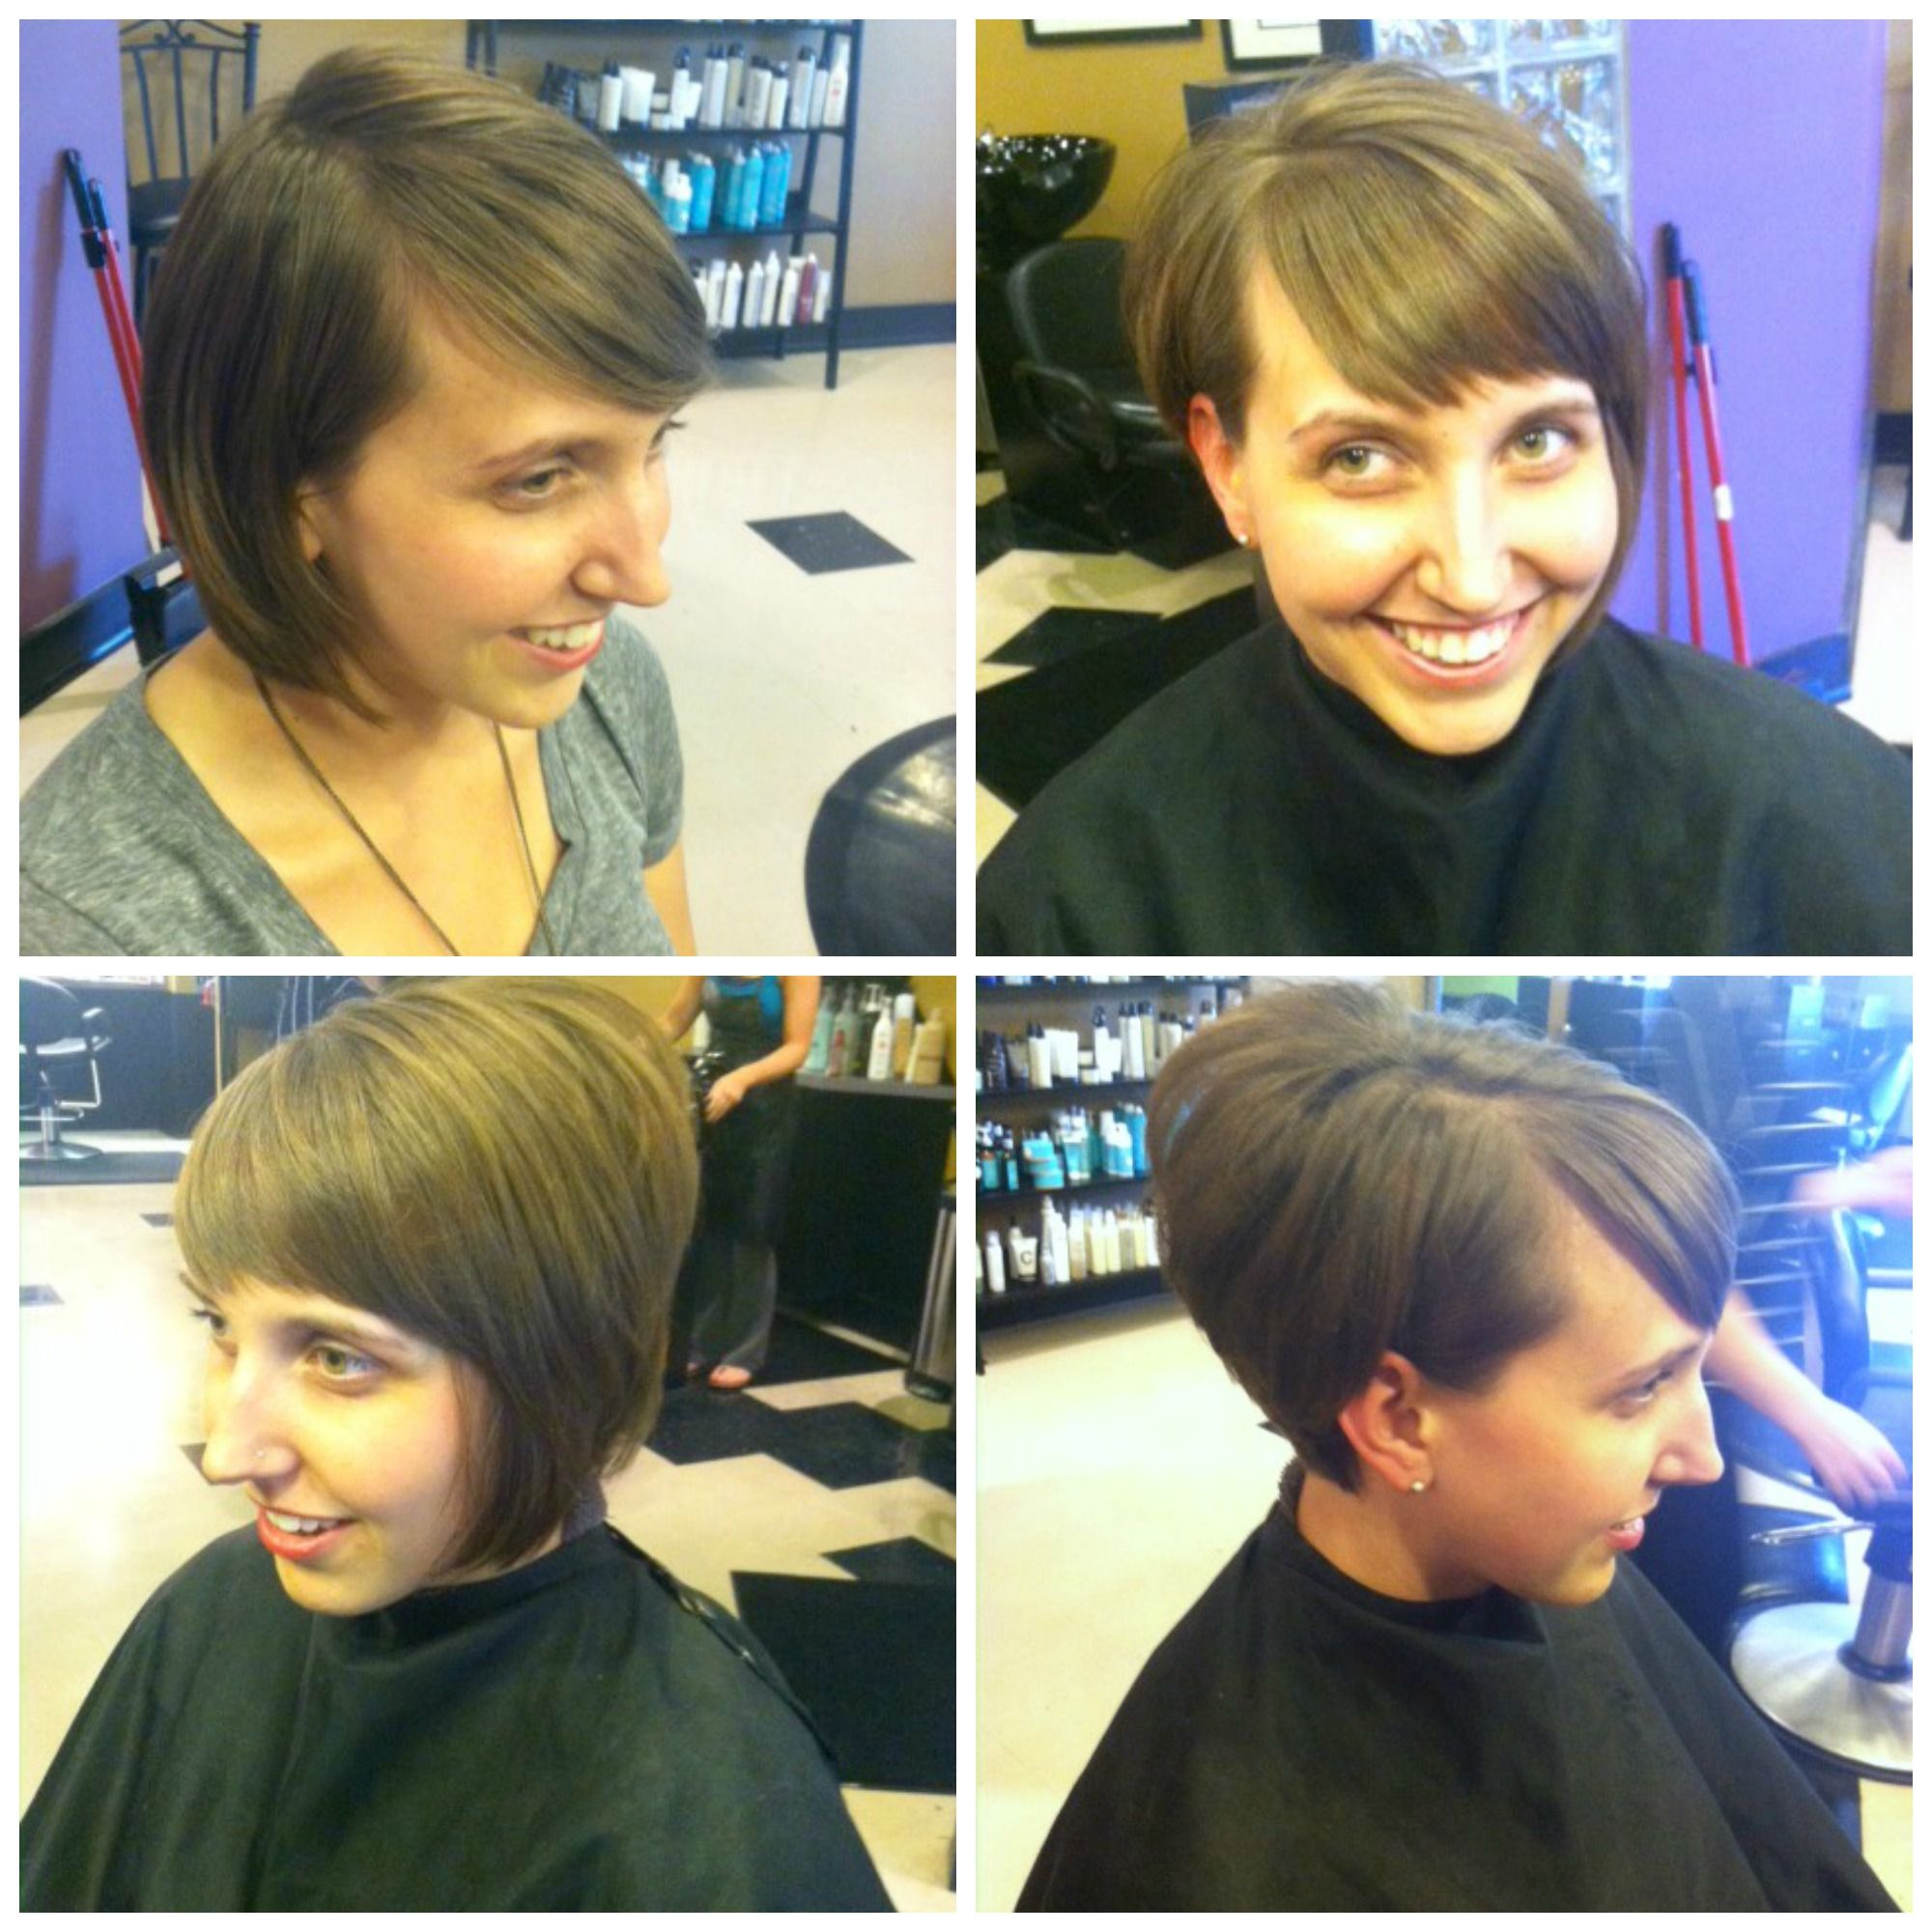 Adorable Asymmetrical Haircut By Jamie At Avantgarde Salon Spa In